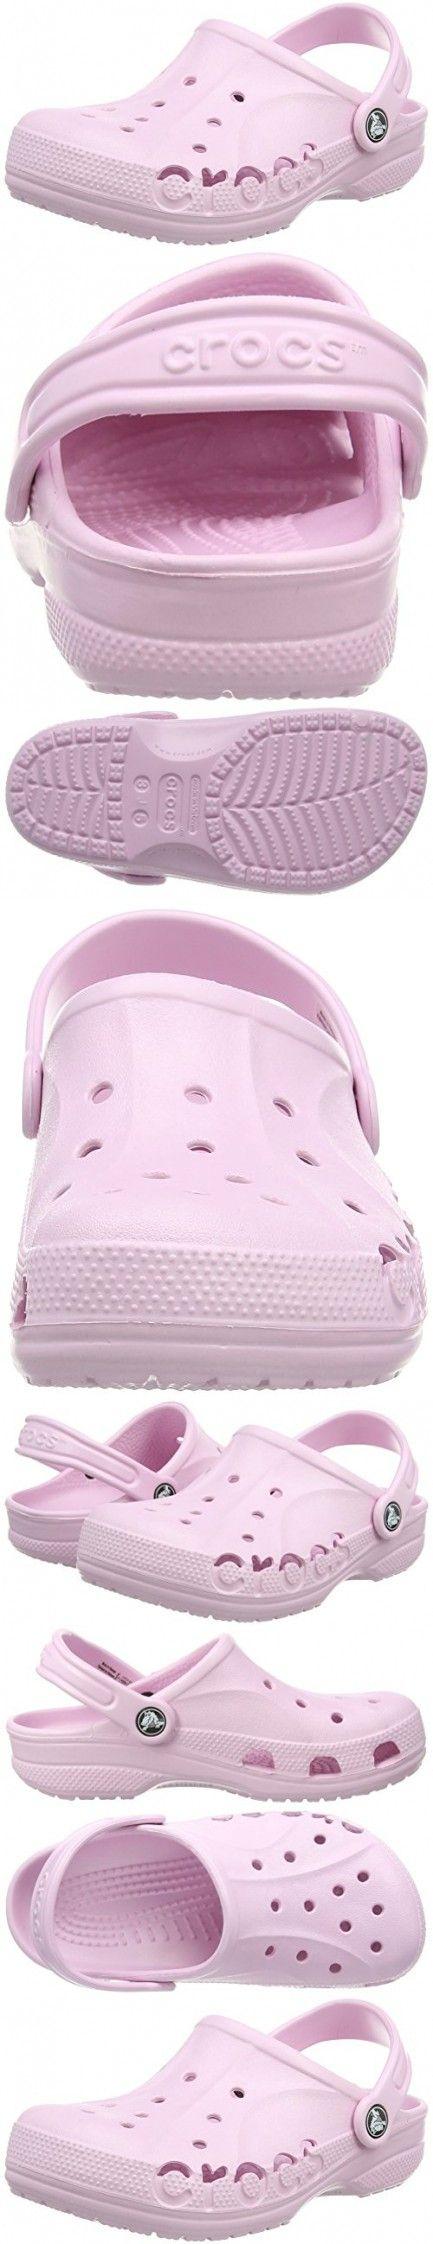 Crocs Baya Kids Clog, Ballerina Pink, 12-13 M US Little Kid